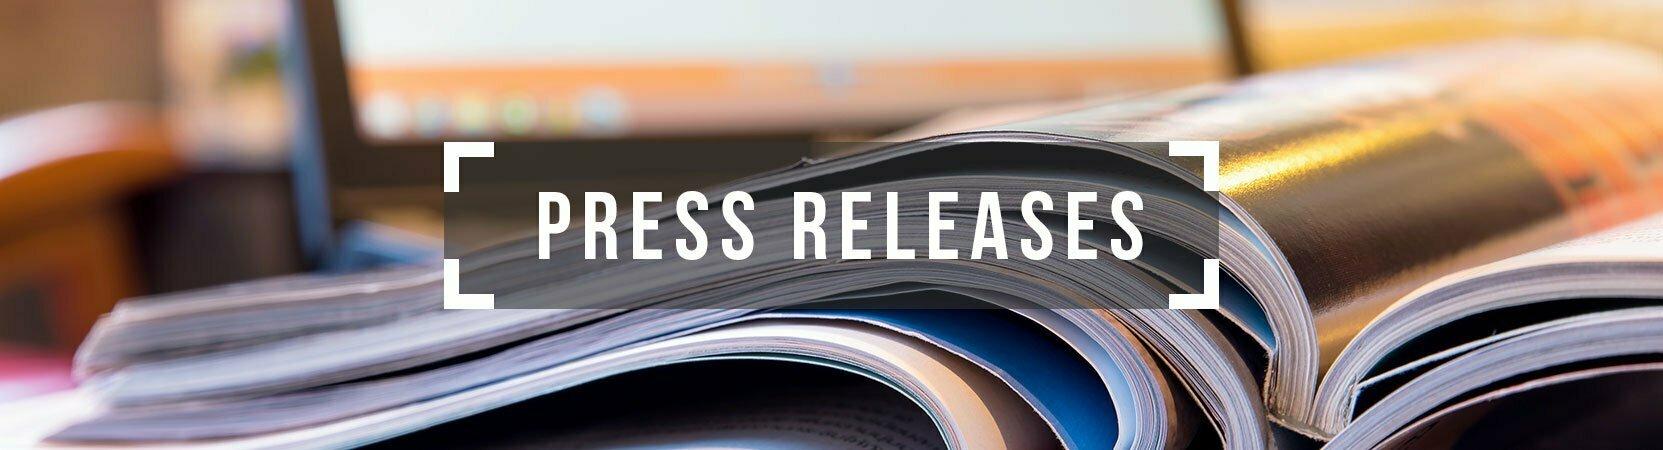 Efl press releases banner 3